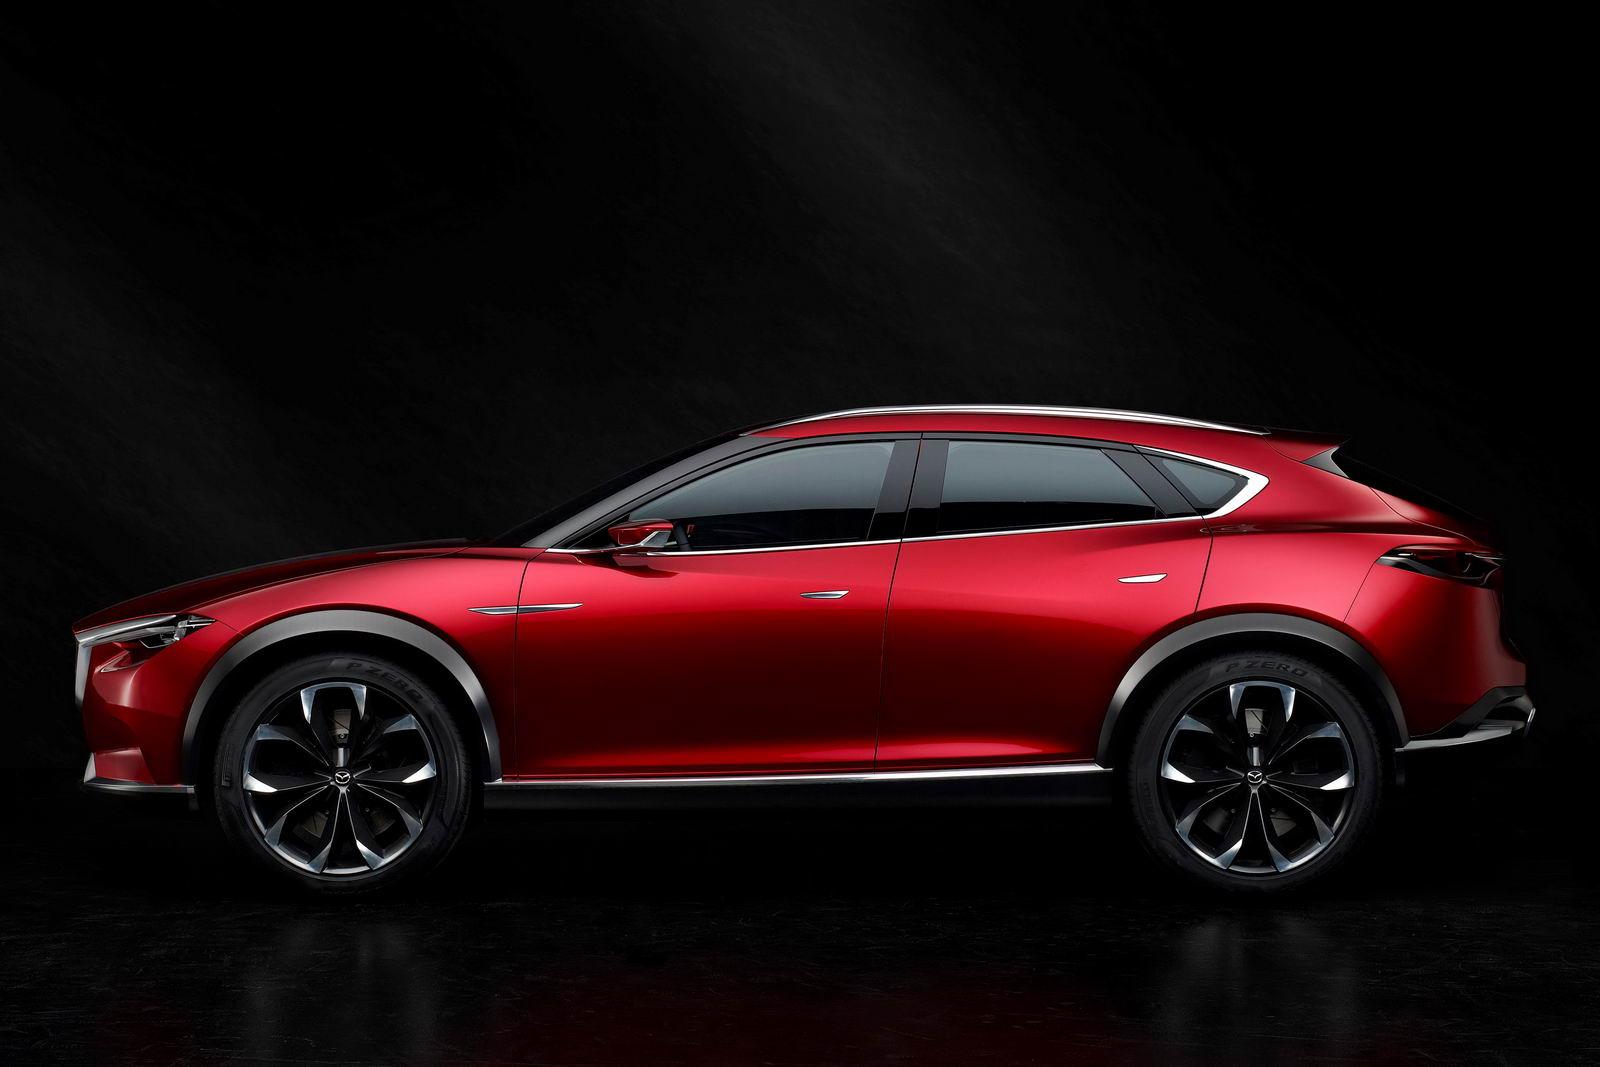 Mazda Cx 6 >> Mazda Koeru Concept Previews Upcoming CX-7 SUV | Carscoops